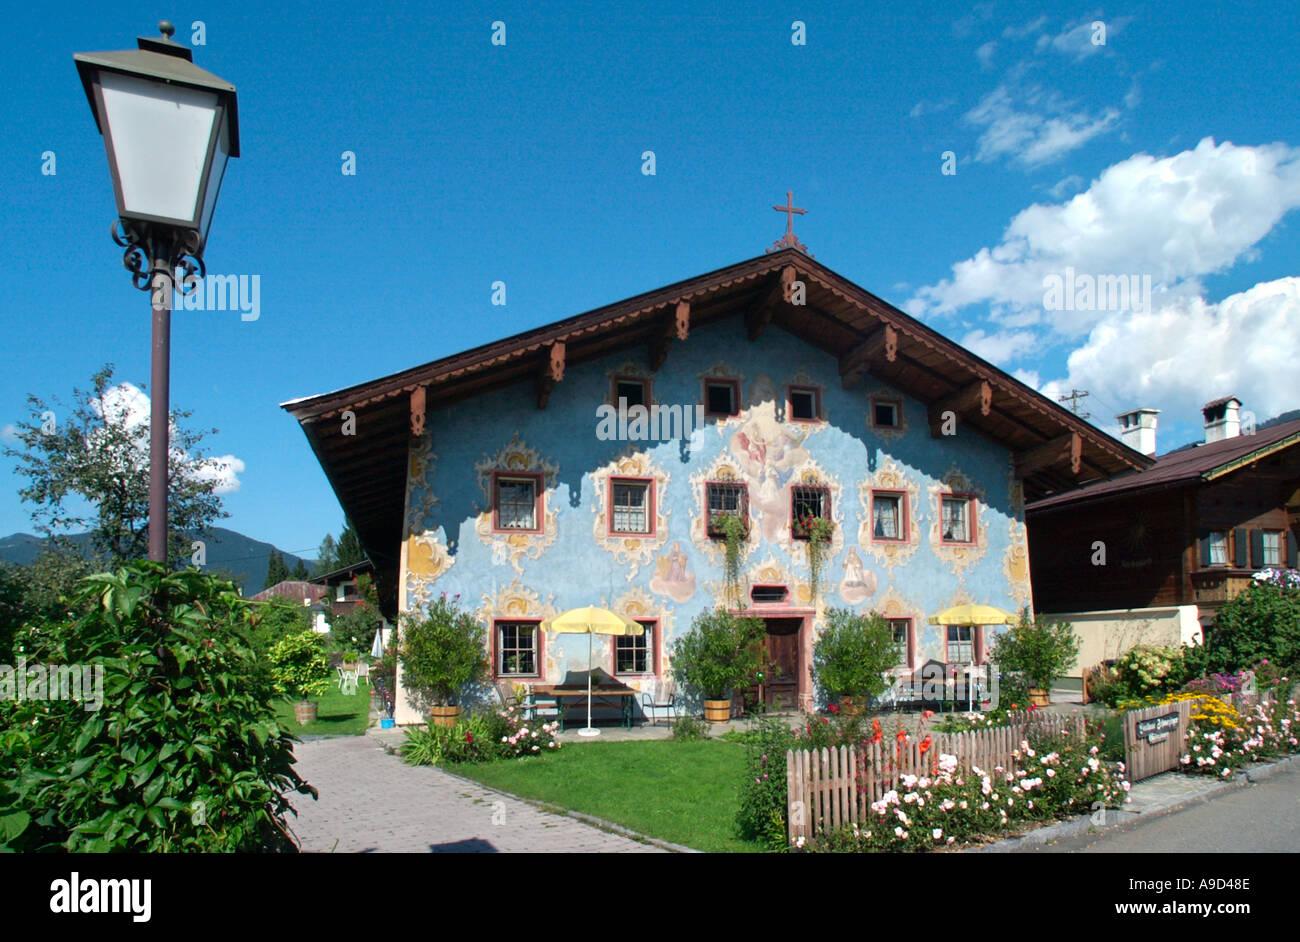 Traditional Tyrolean House St Johann In Tirol Austria